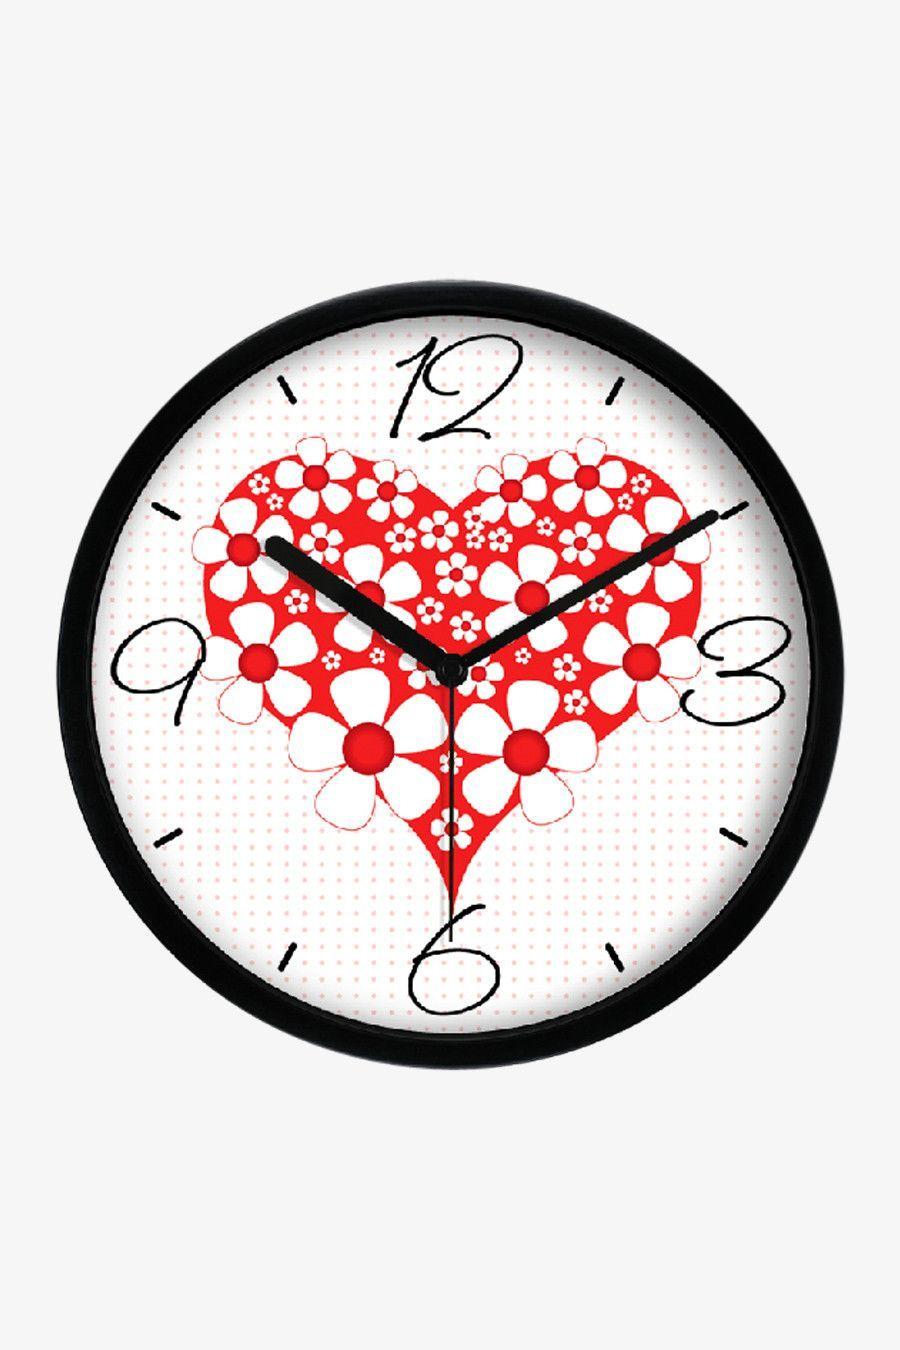 Floral Heart Clock Black Clock Fashion Art Wall Clock